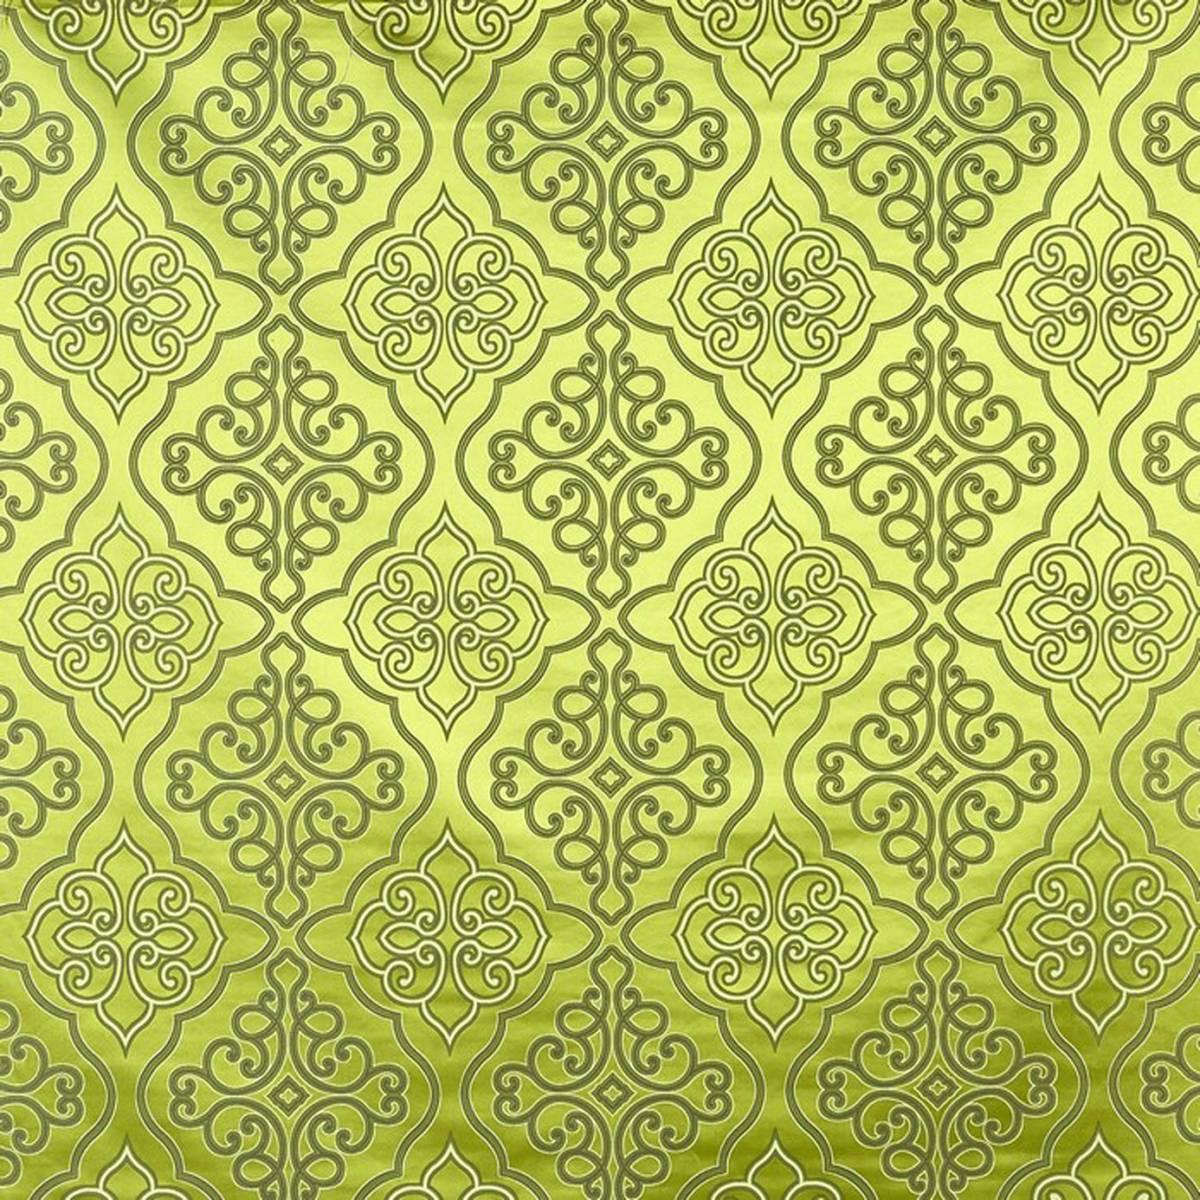 Tiffany fabric palm 3598 627 prestigious textiles deco fabrics collection - Deco fabriek ...